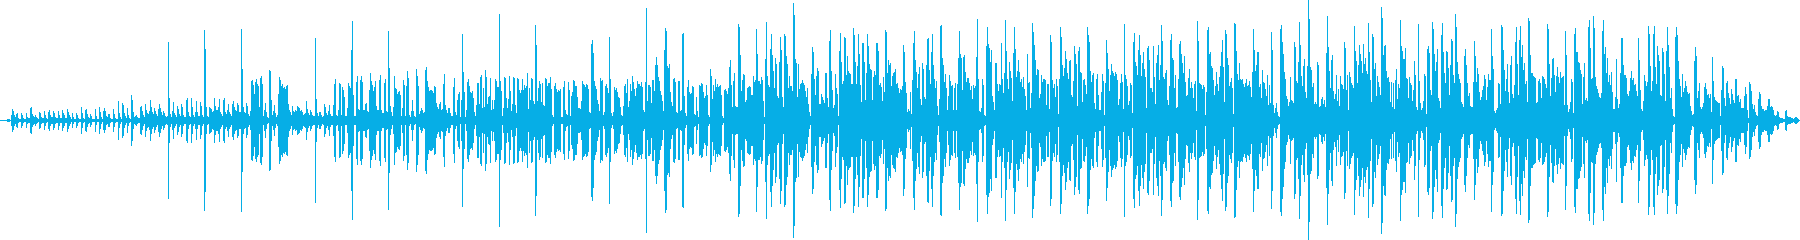 Dj Scratch With D...の再生済みの波形